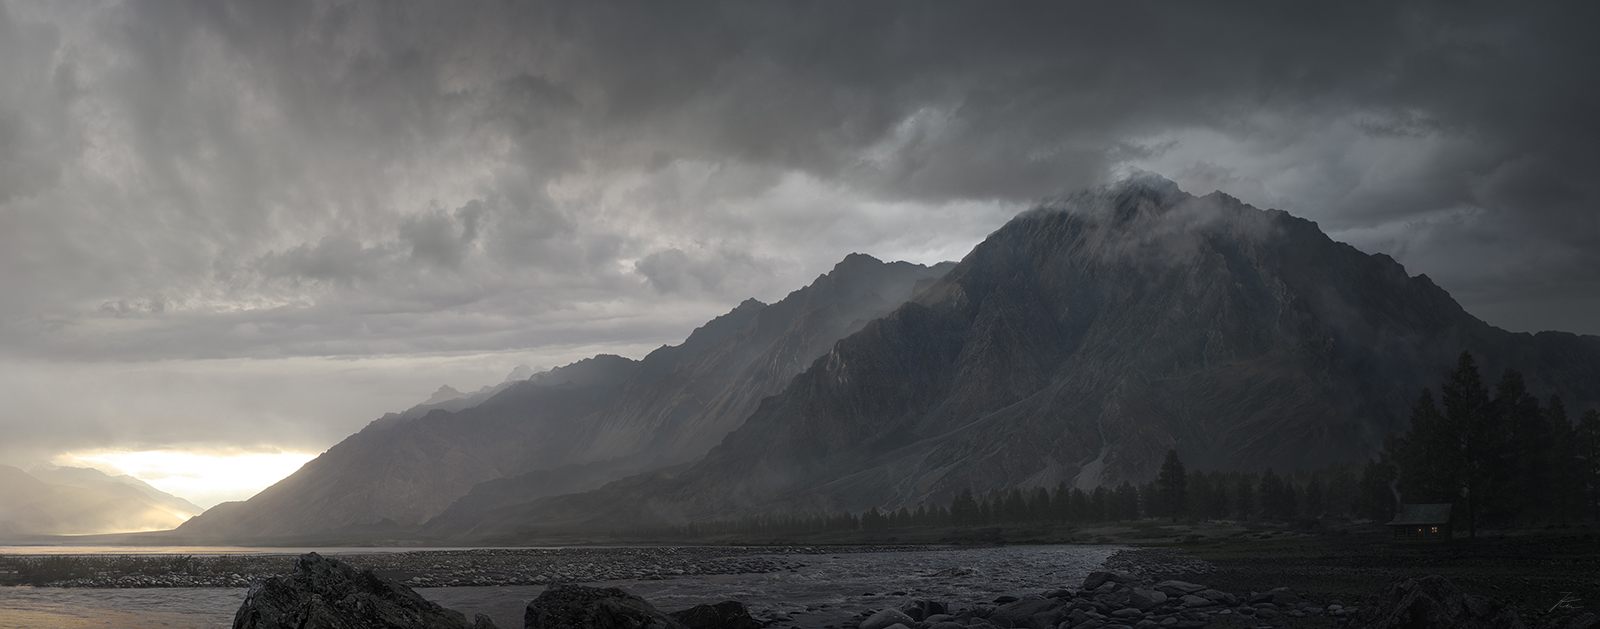 Forlorn by Akajork